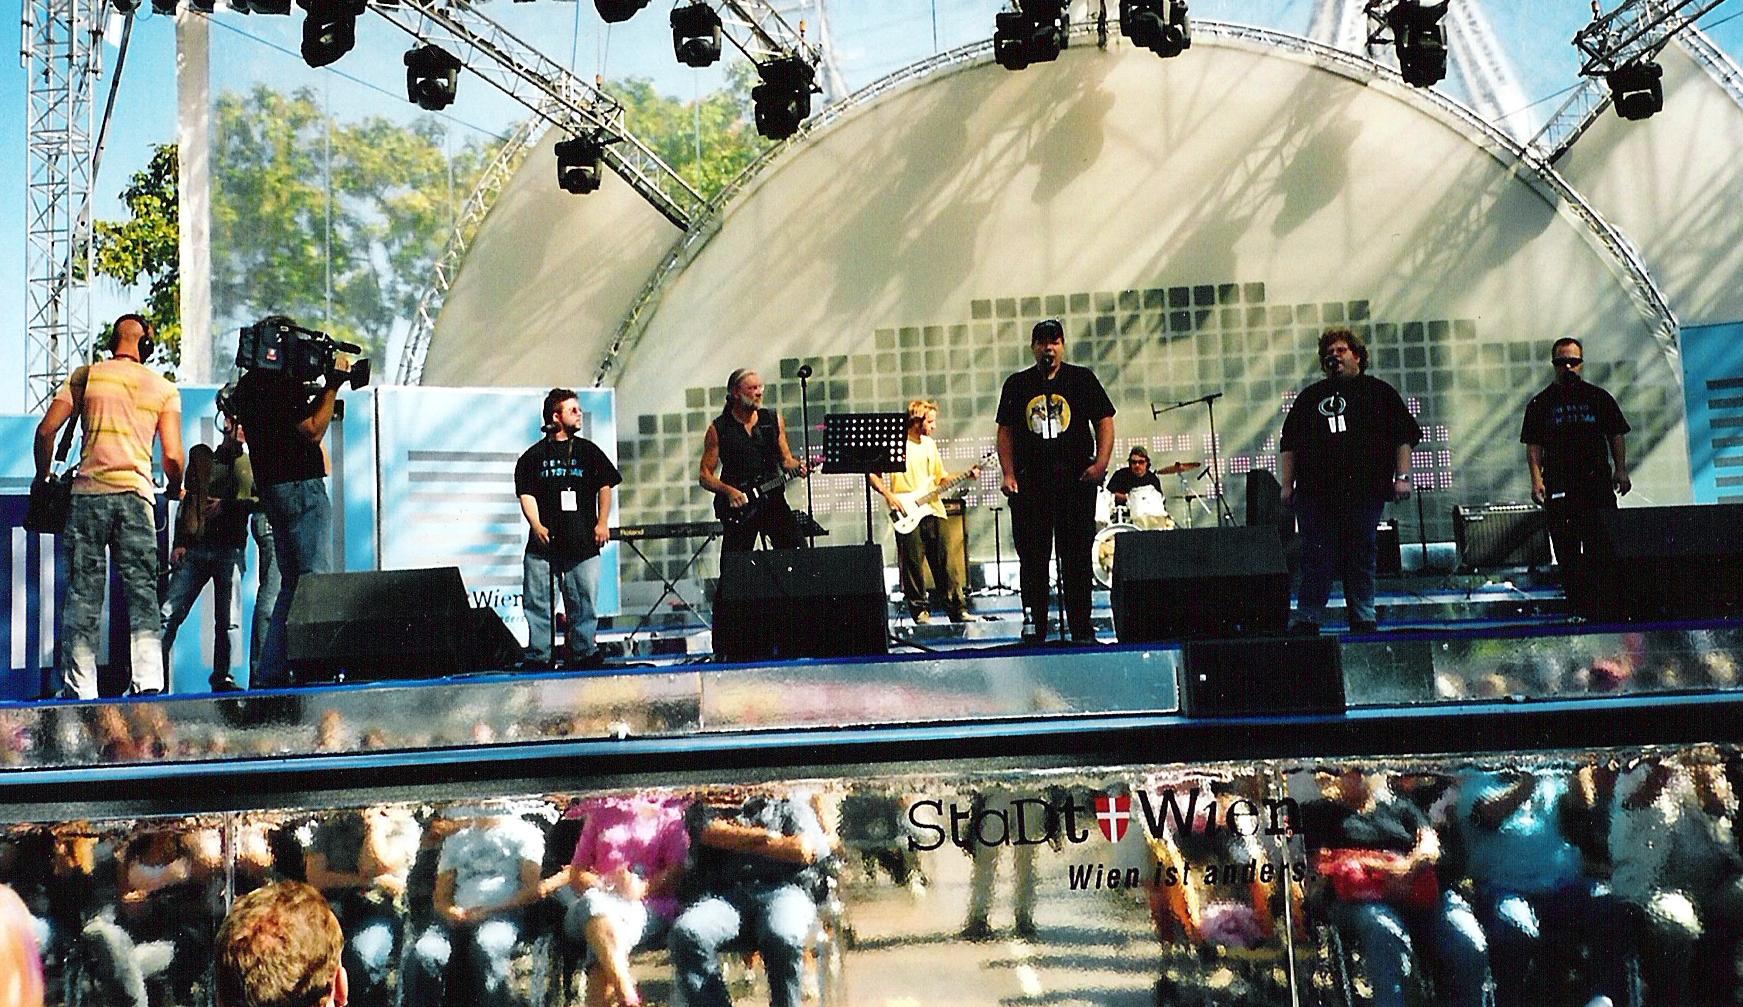 Echt Stoak Prater Gig 2006